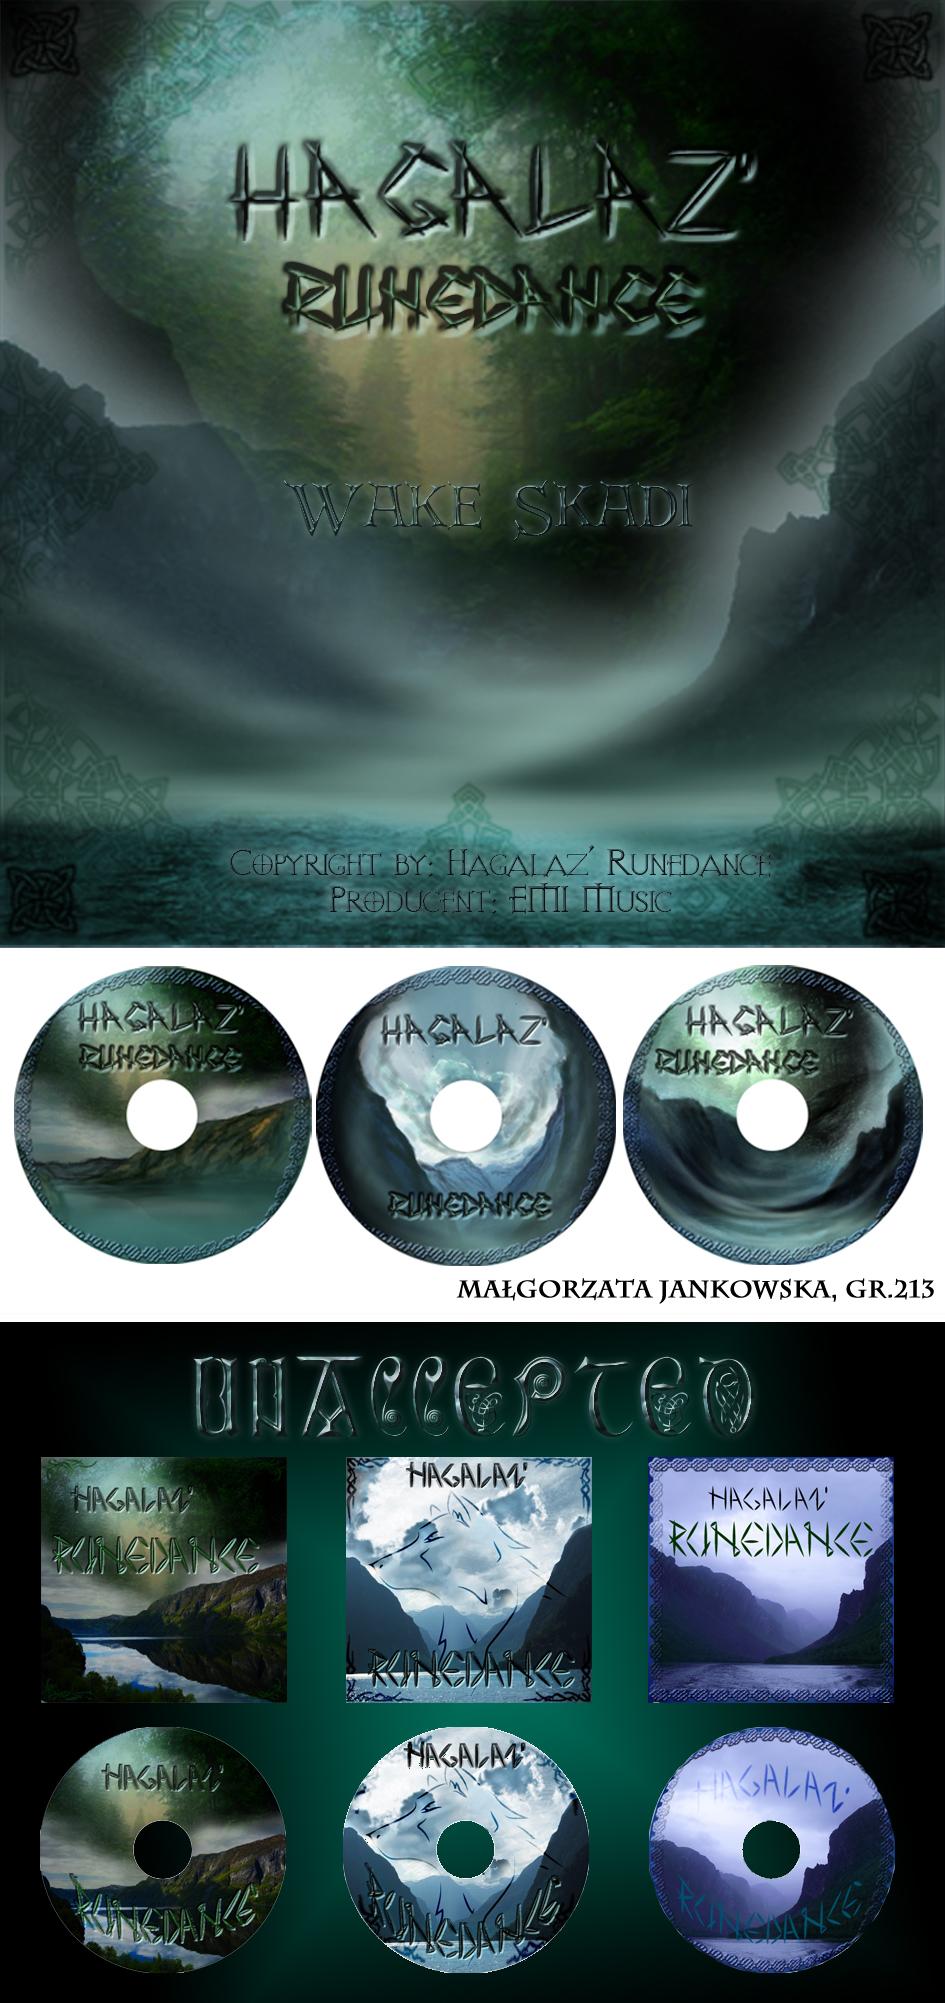 Hagalaz' Runedance by Vrolok87